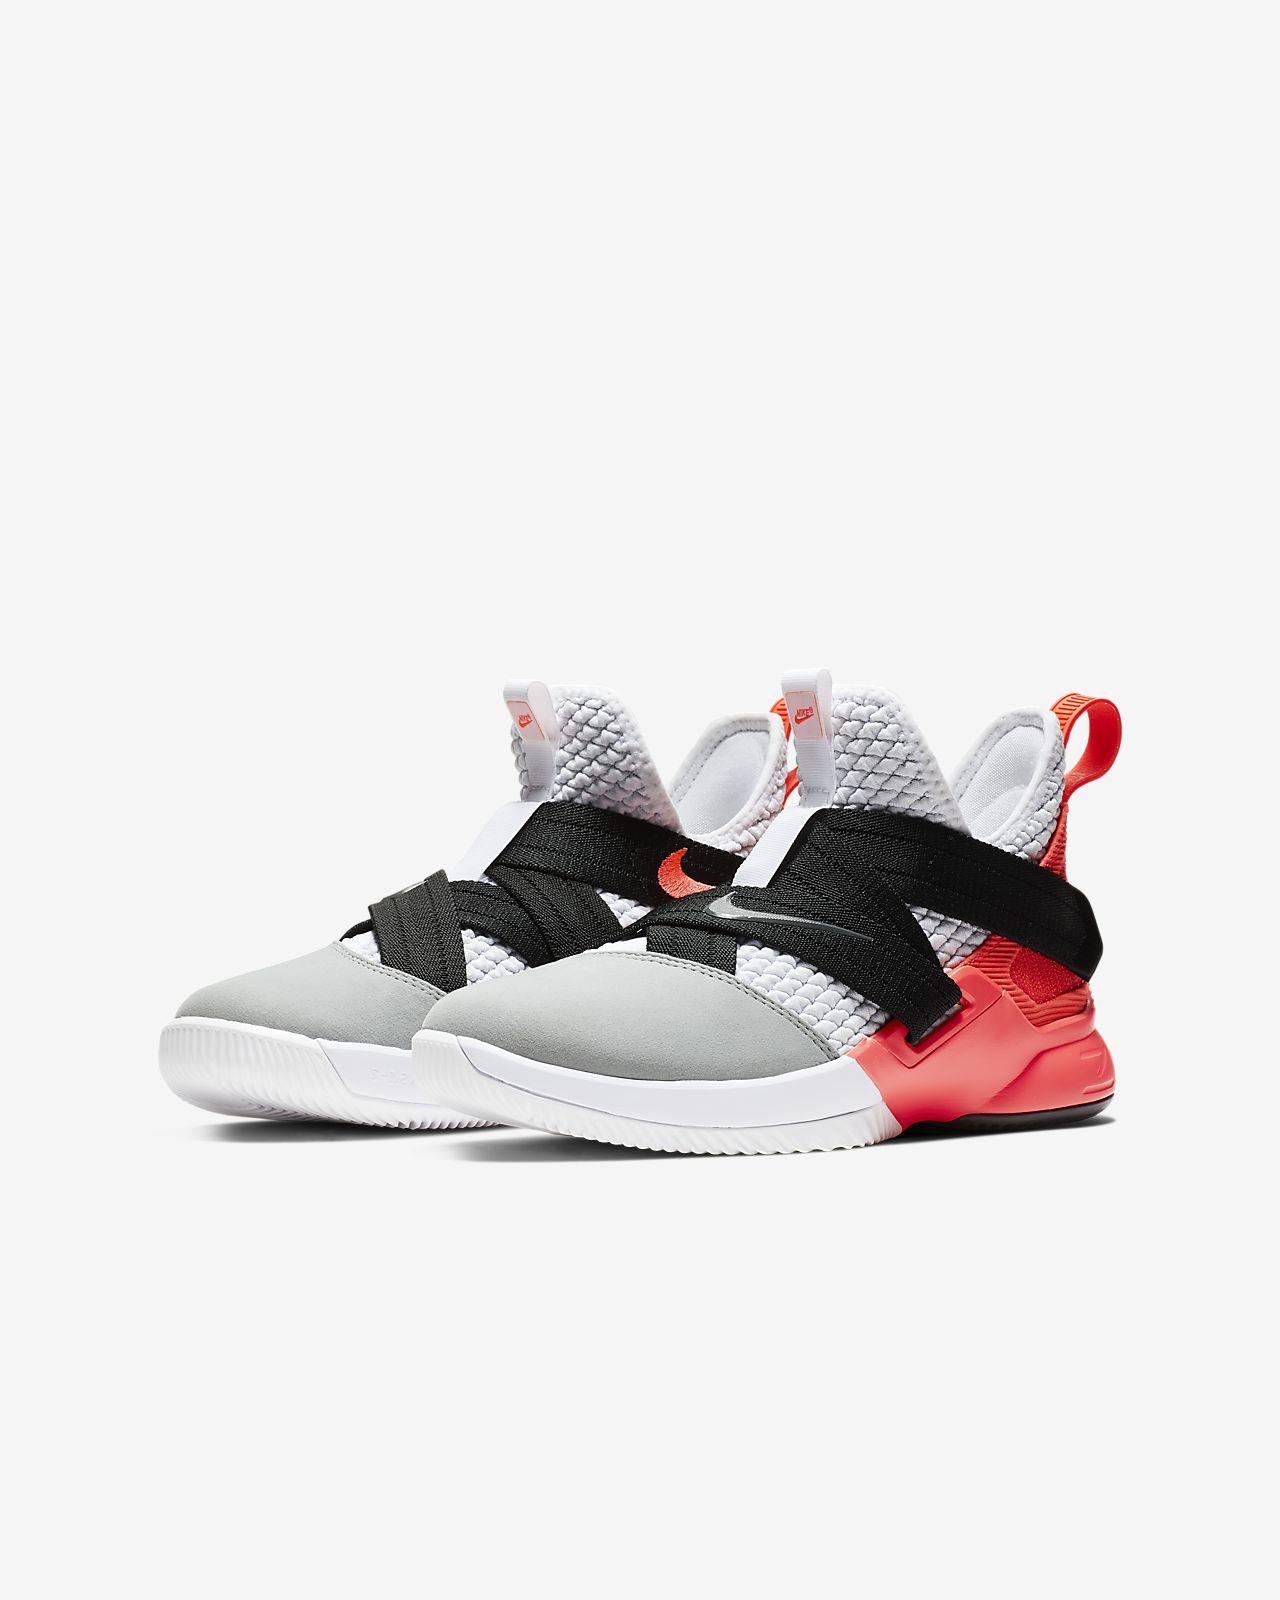 bfa60e4825f LeBron Soldier 12 SFG Big Kids  Basketball Shoe. Nike.com